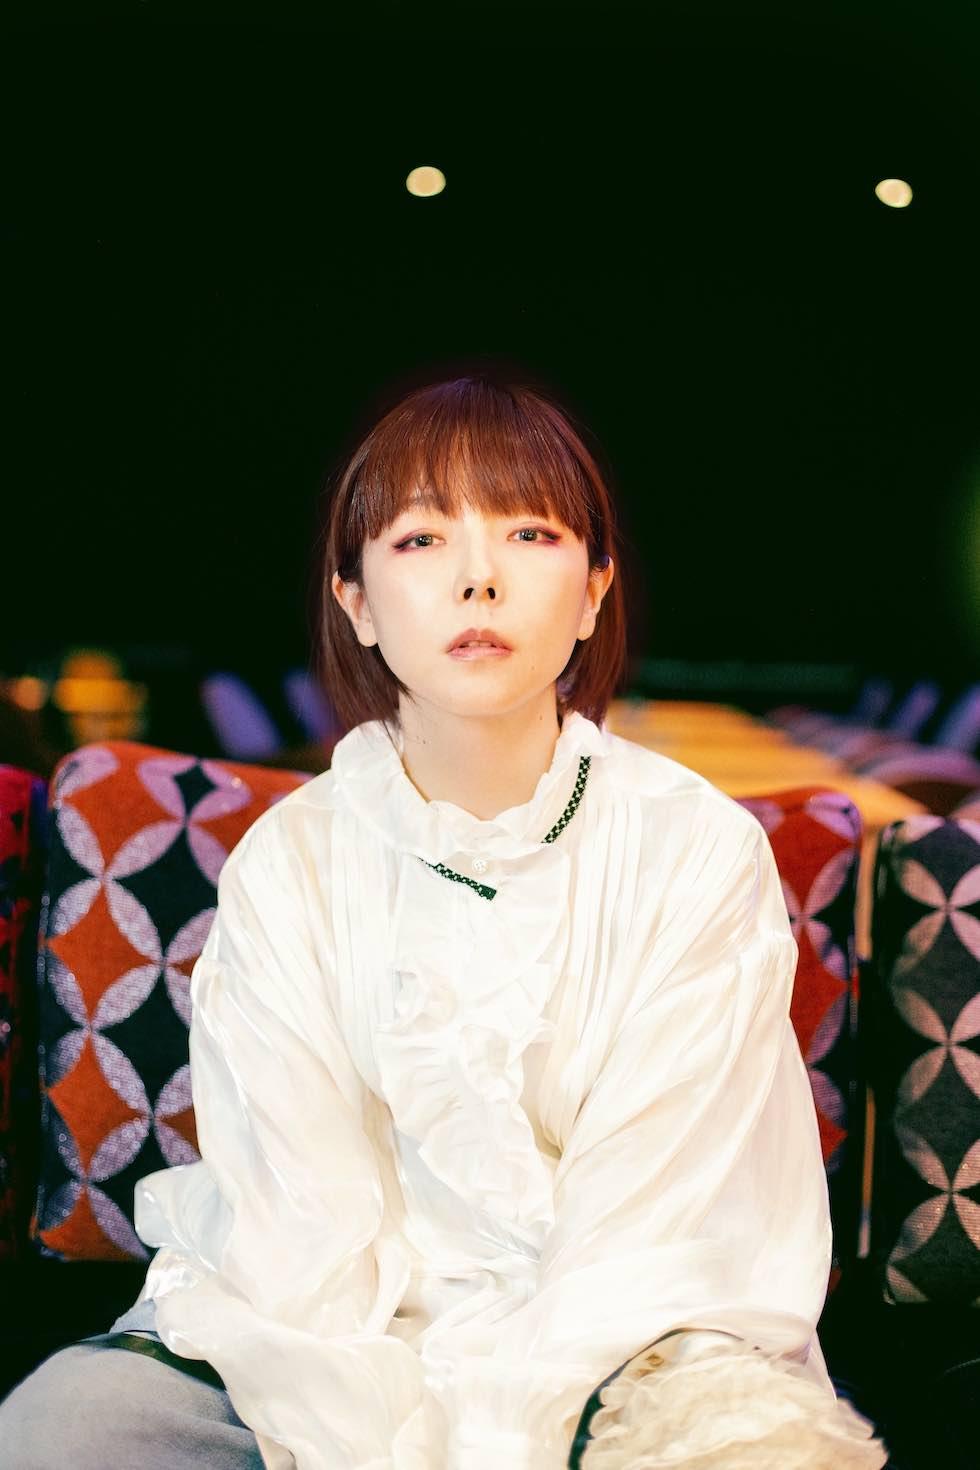 aiko、ニューアルバムより新曲「磁石」のMusic Videoを公開!